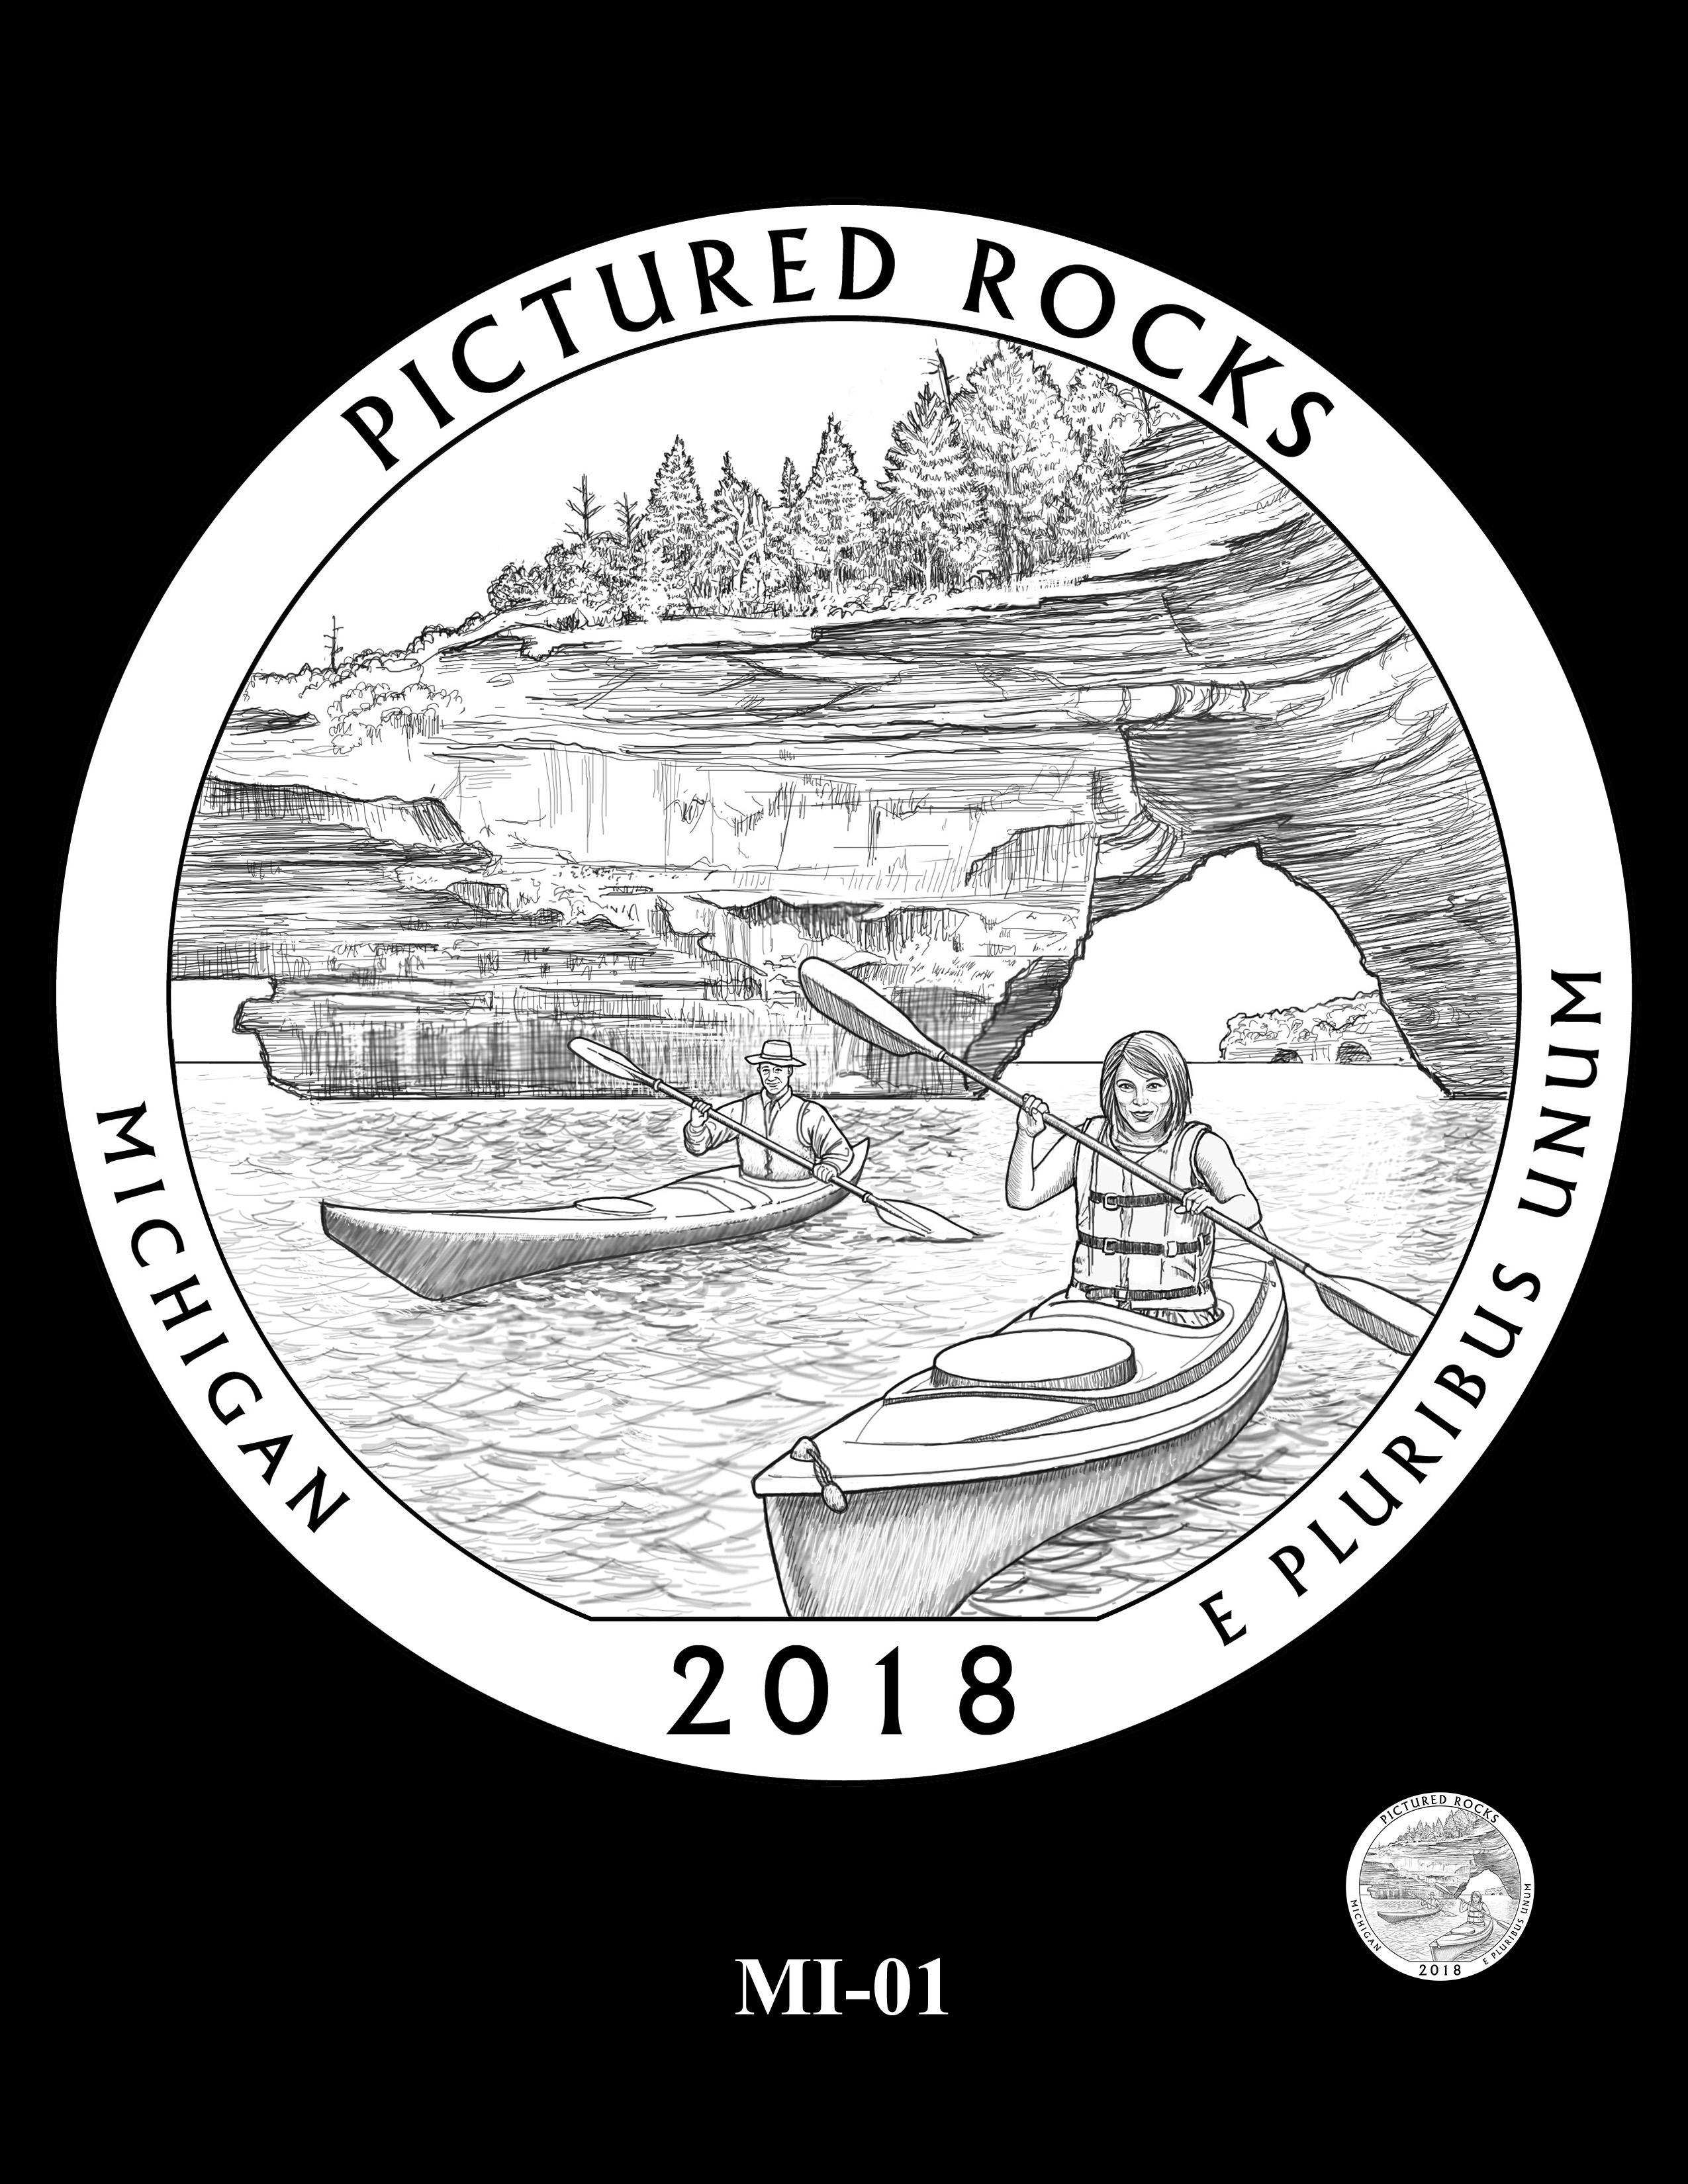 MI-01 -- 2018 America the Beautiful® Quarters Program